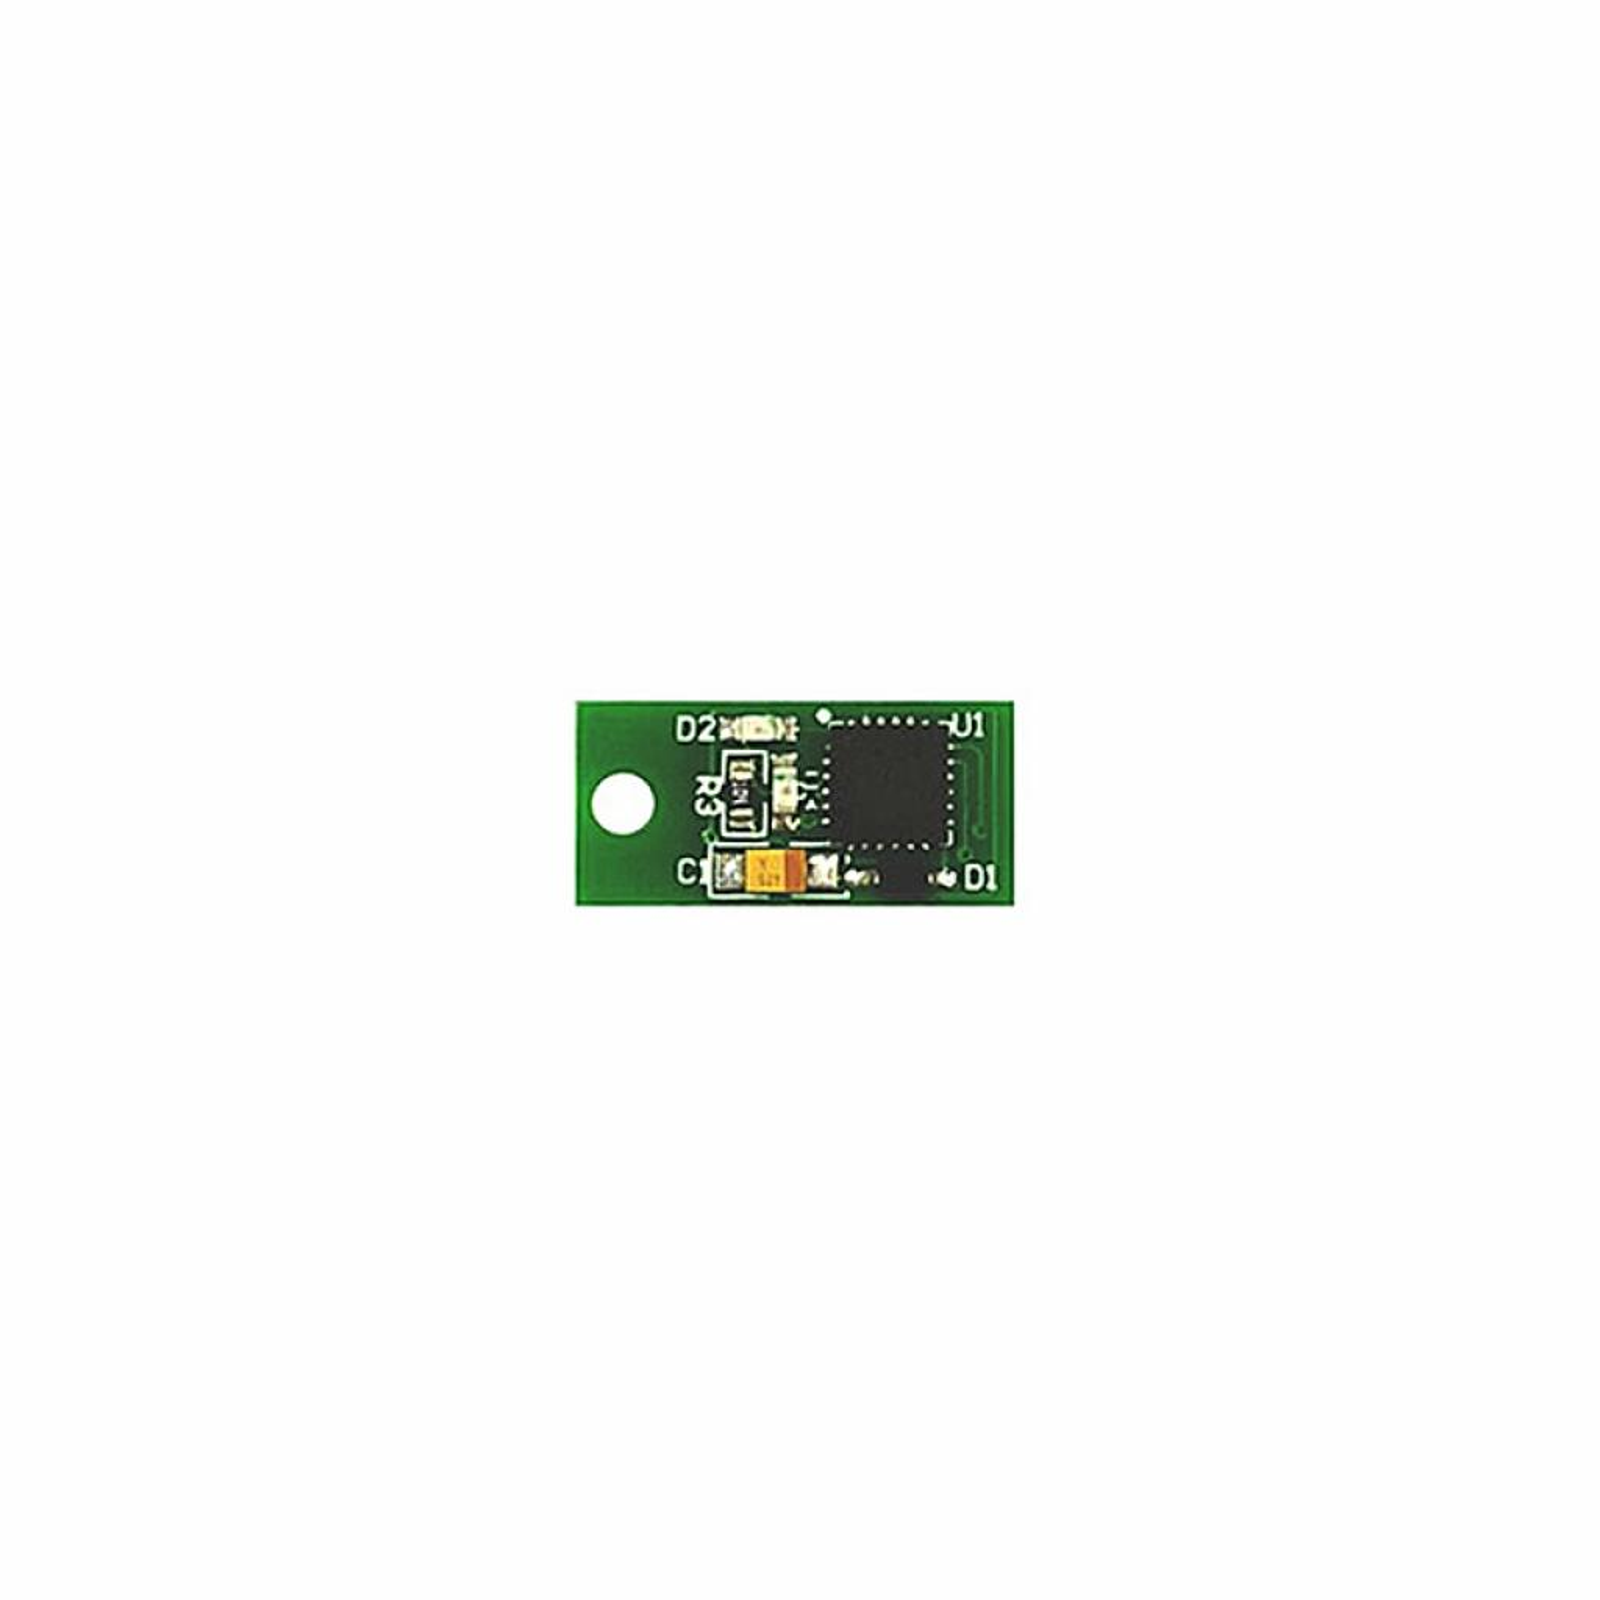 Чип для картриджа CanonC250 (8517B002) 21.5k cyan Static Control (C250CP-CEU)